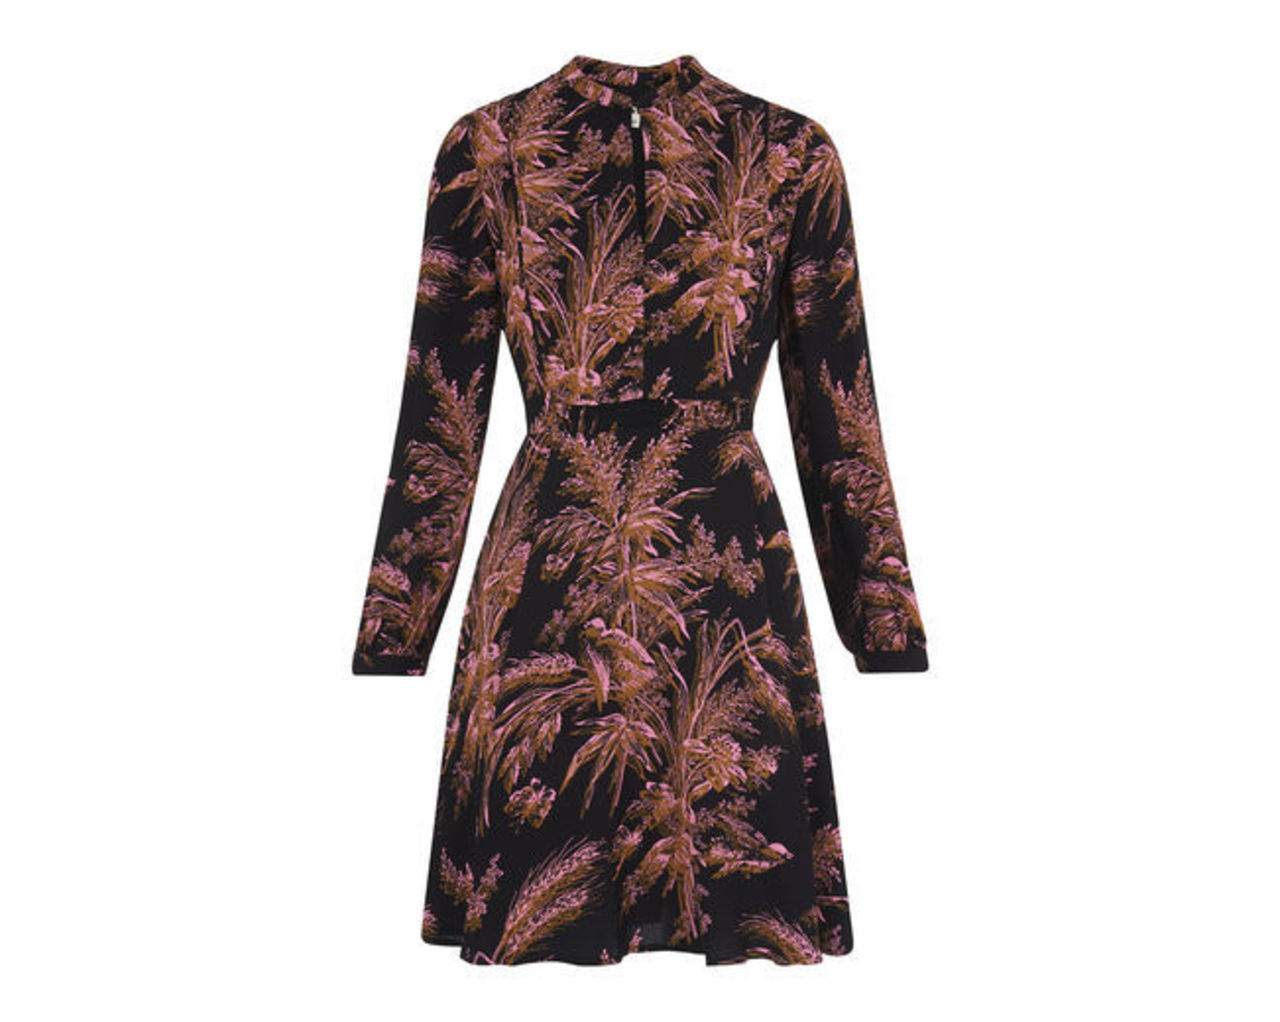 Camille Wren Print Dress